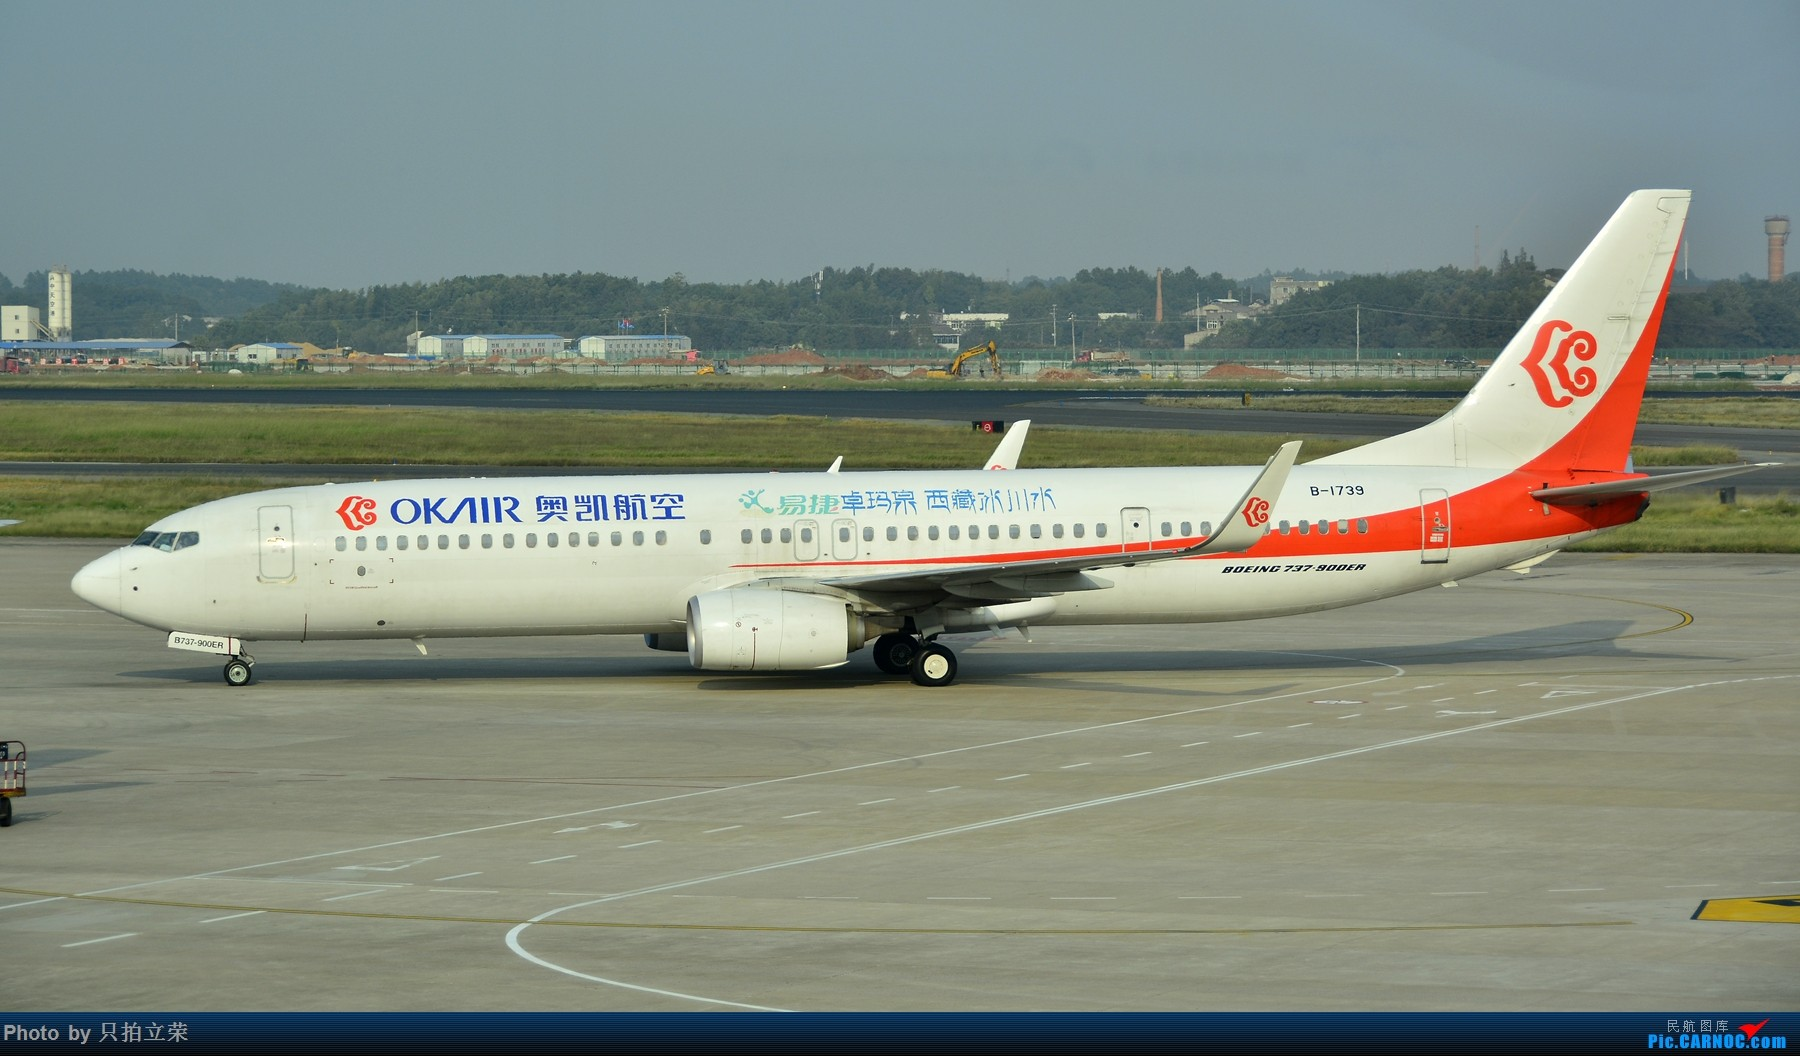 Re:[原创]湖南飞友会之10月9日长沙黄花好货满天飞! BOEING 737-900ER B-1739 中国长沙黄花国际机场